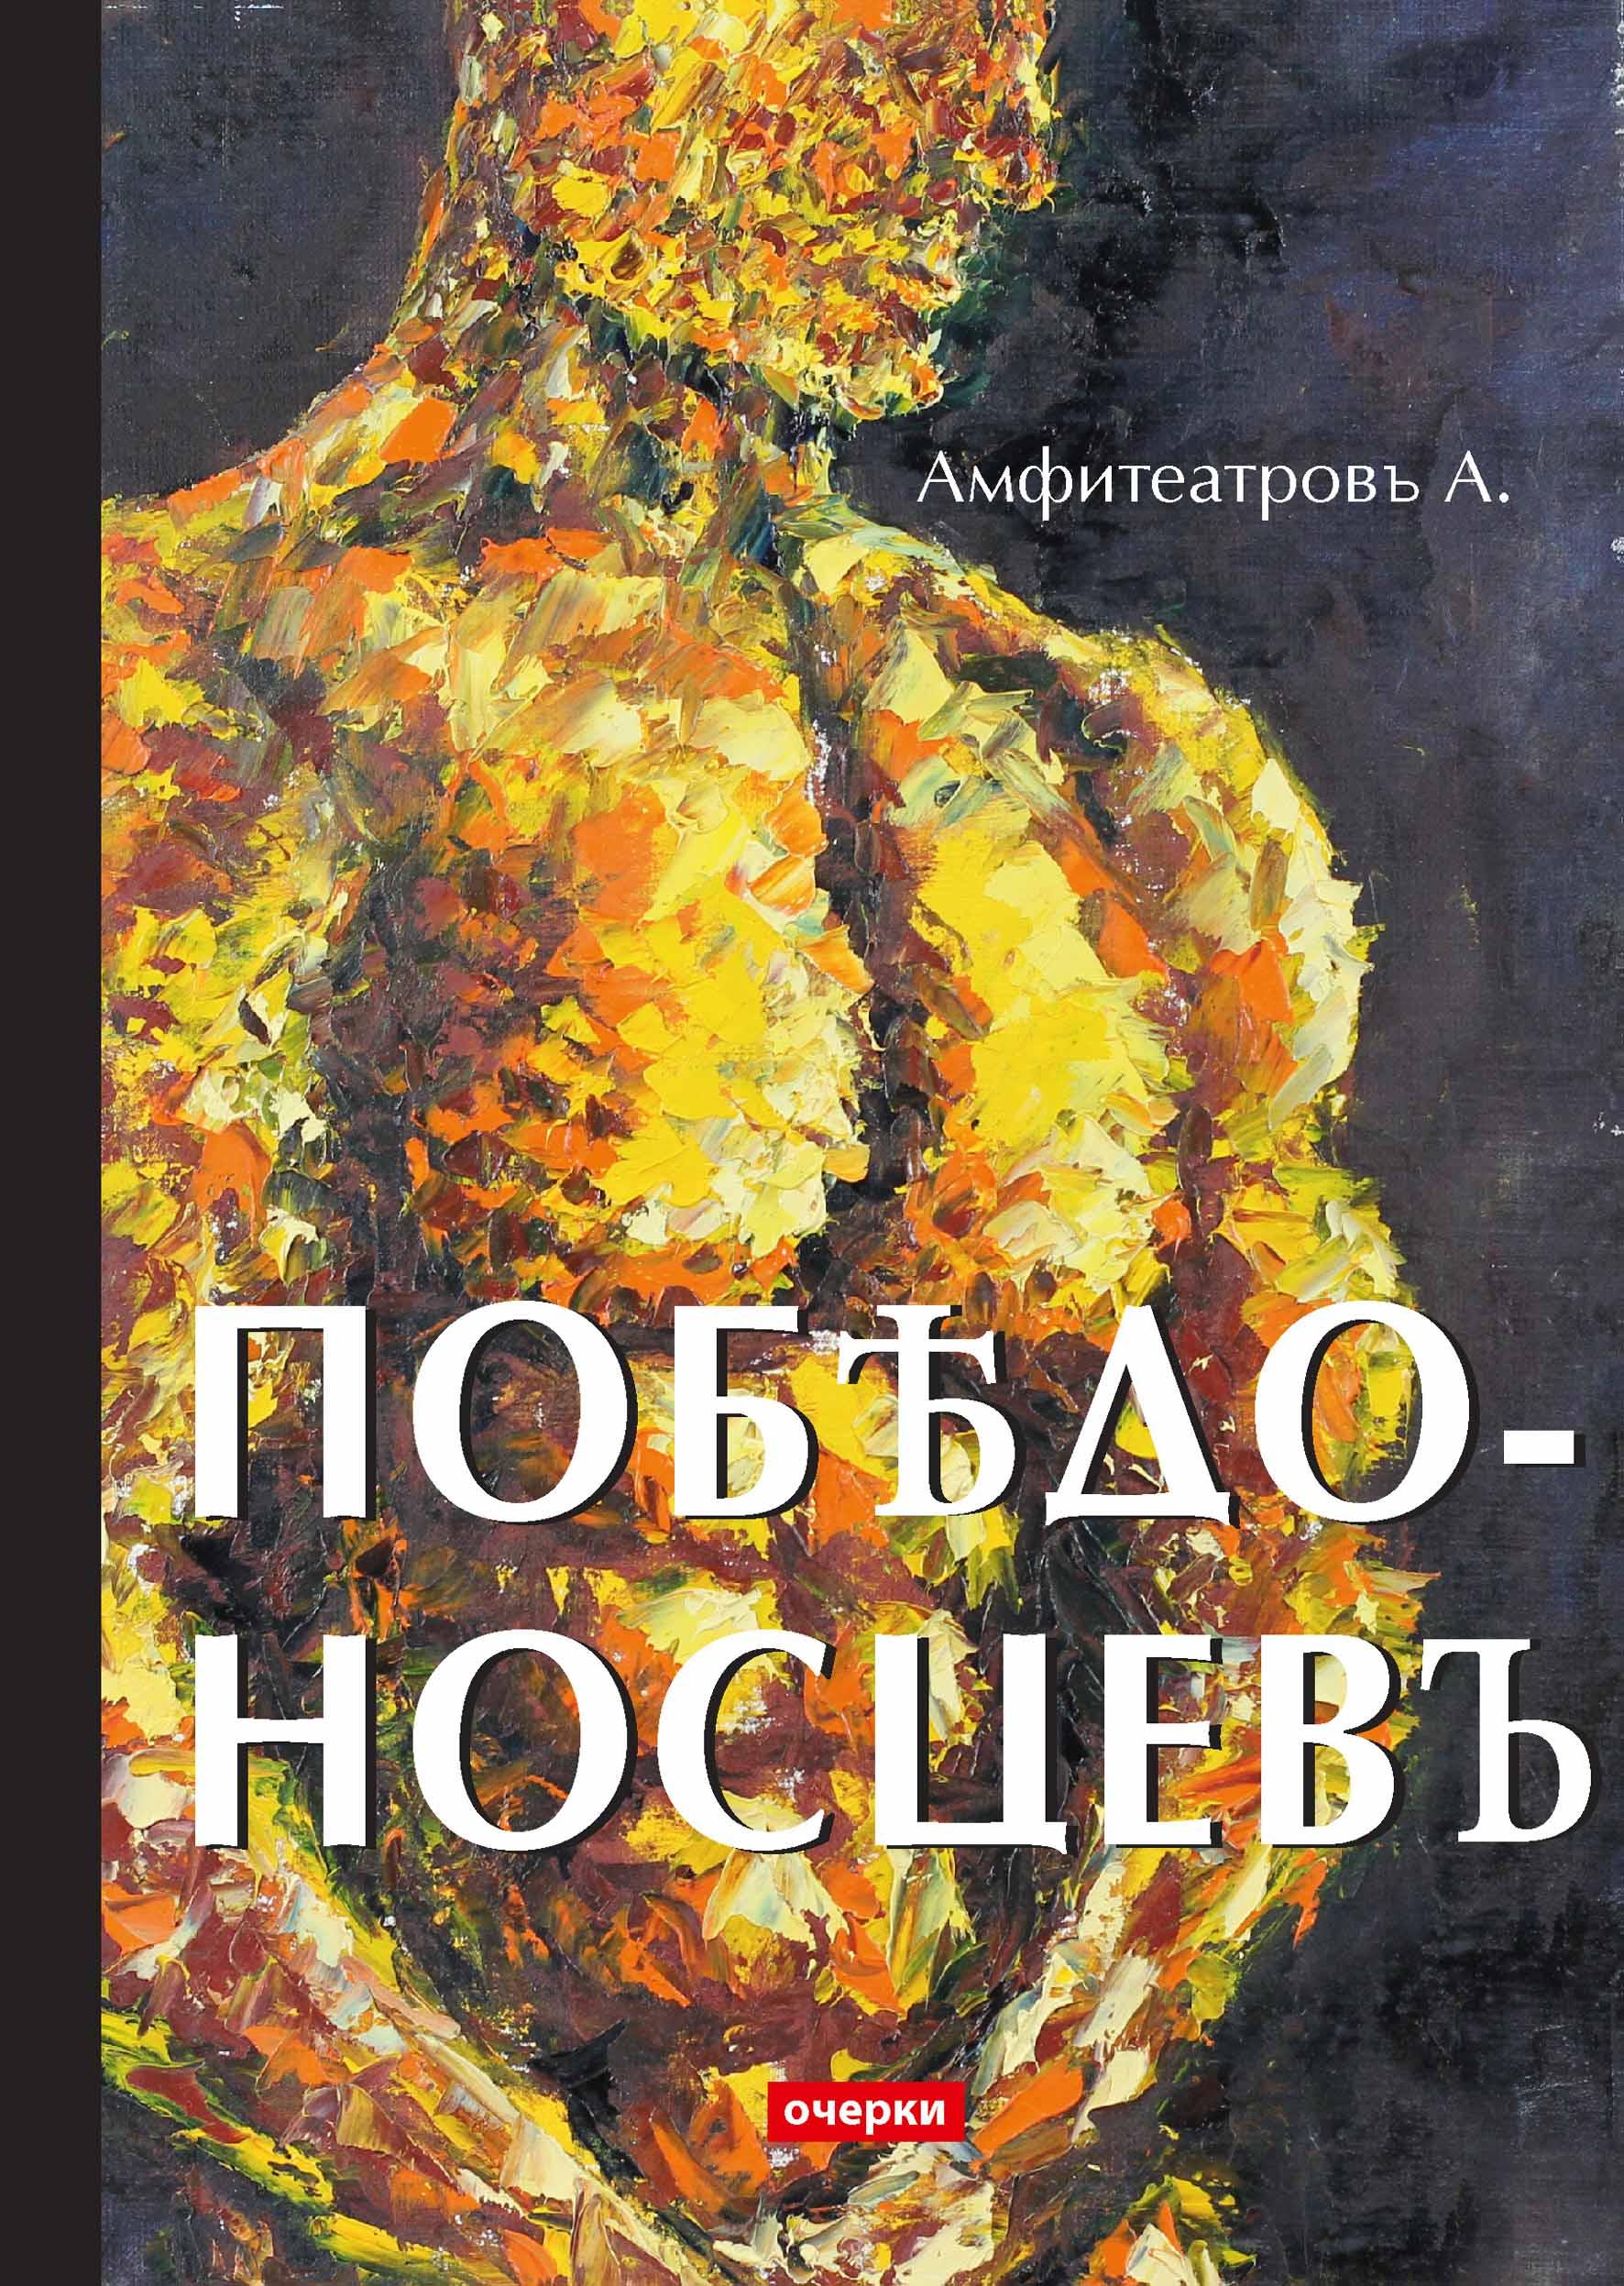 Александр Амфитеатров Победоносцевъ александр амфитеатров старик суворин